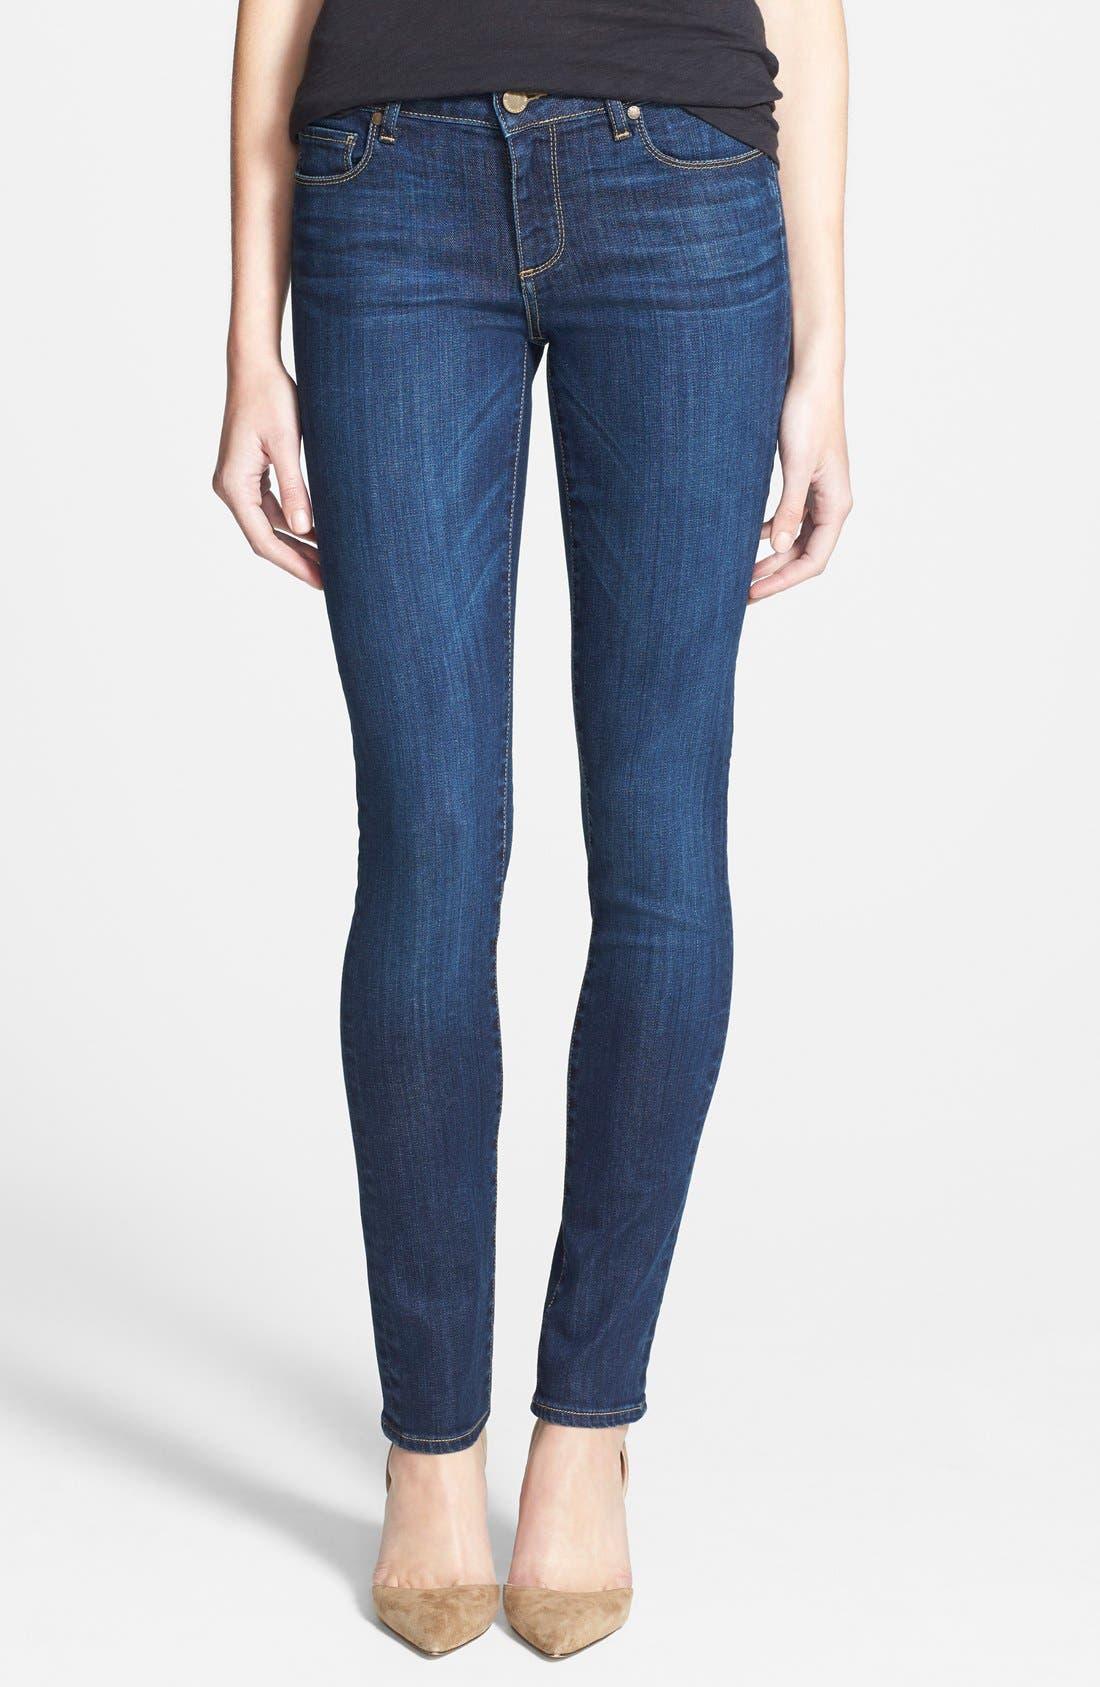 Alternate Image 1 Selected - Paige Denim 'Skyline' Skinny Jeans (Lange)